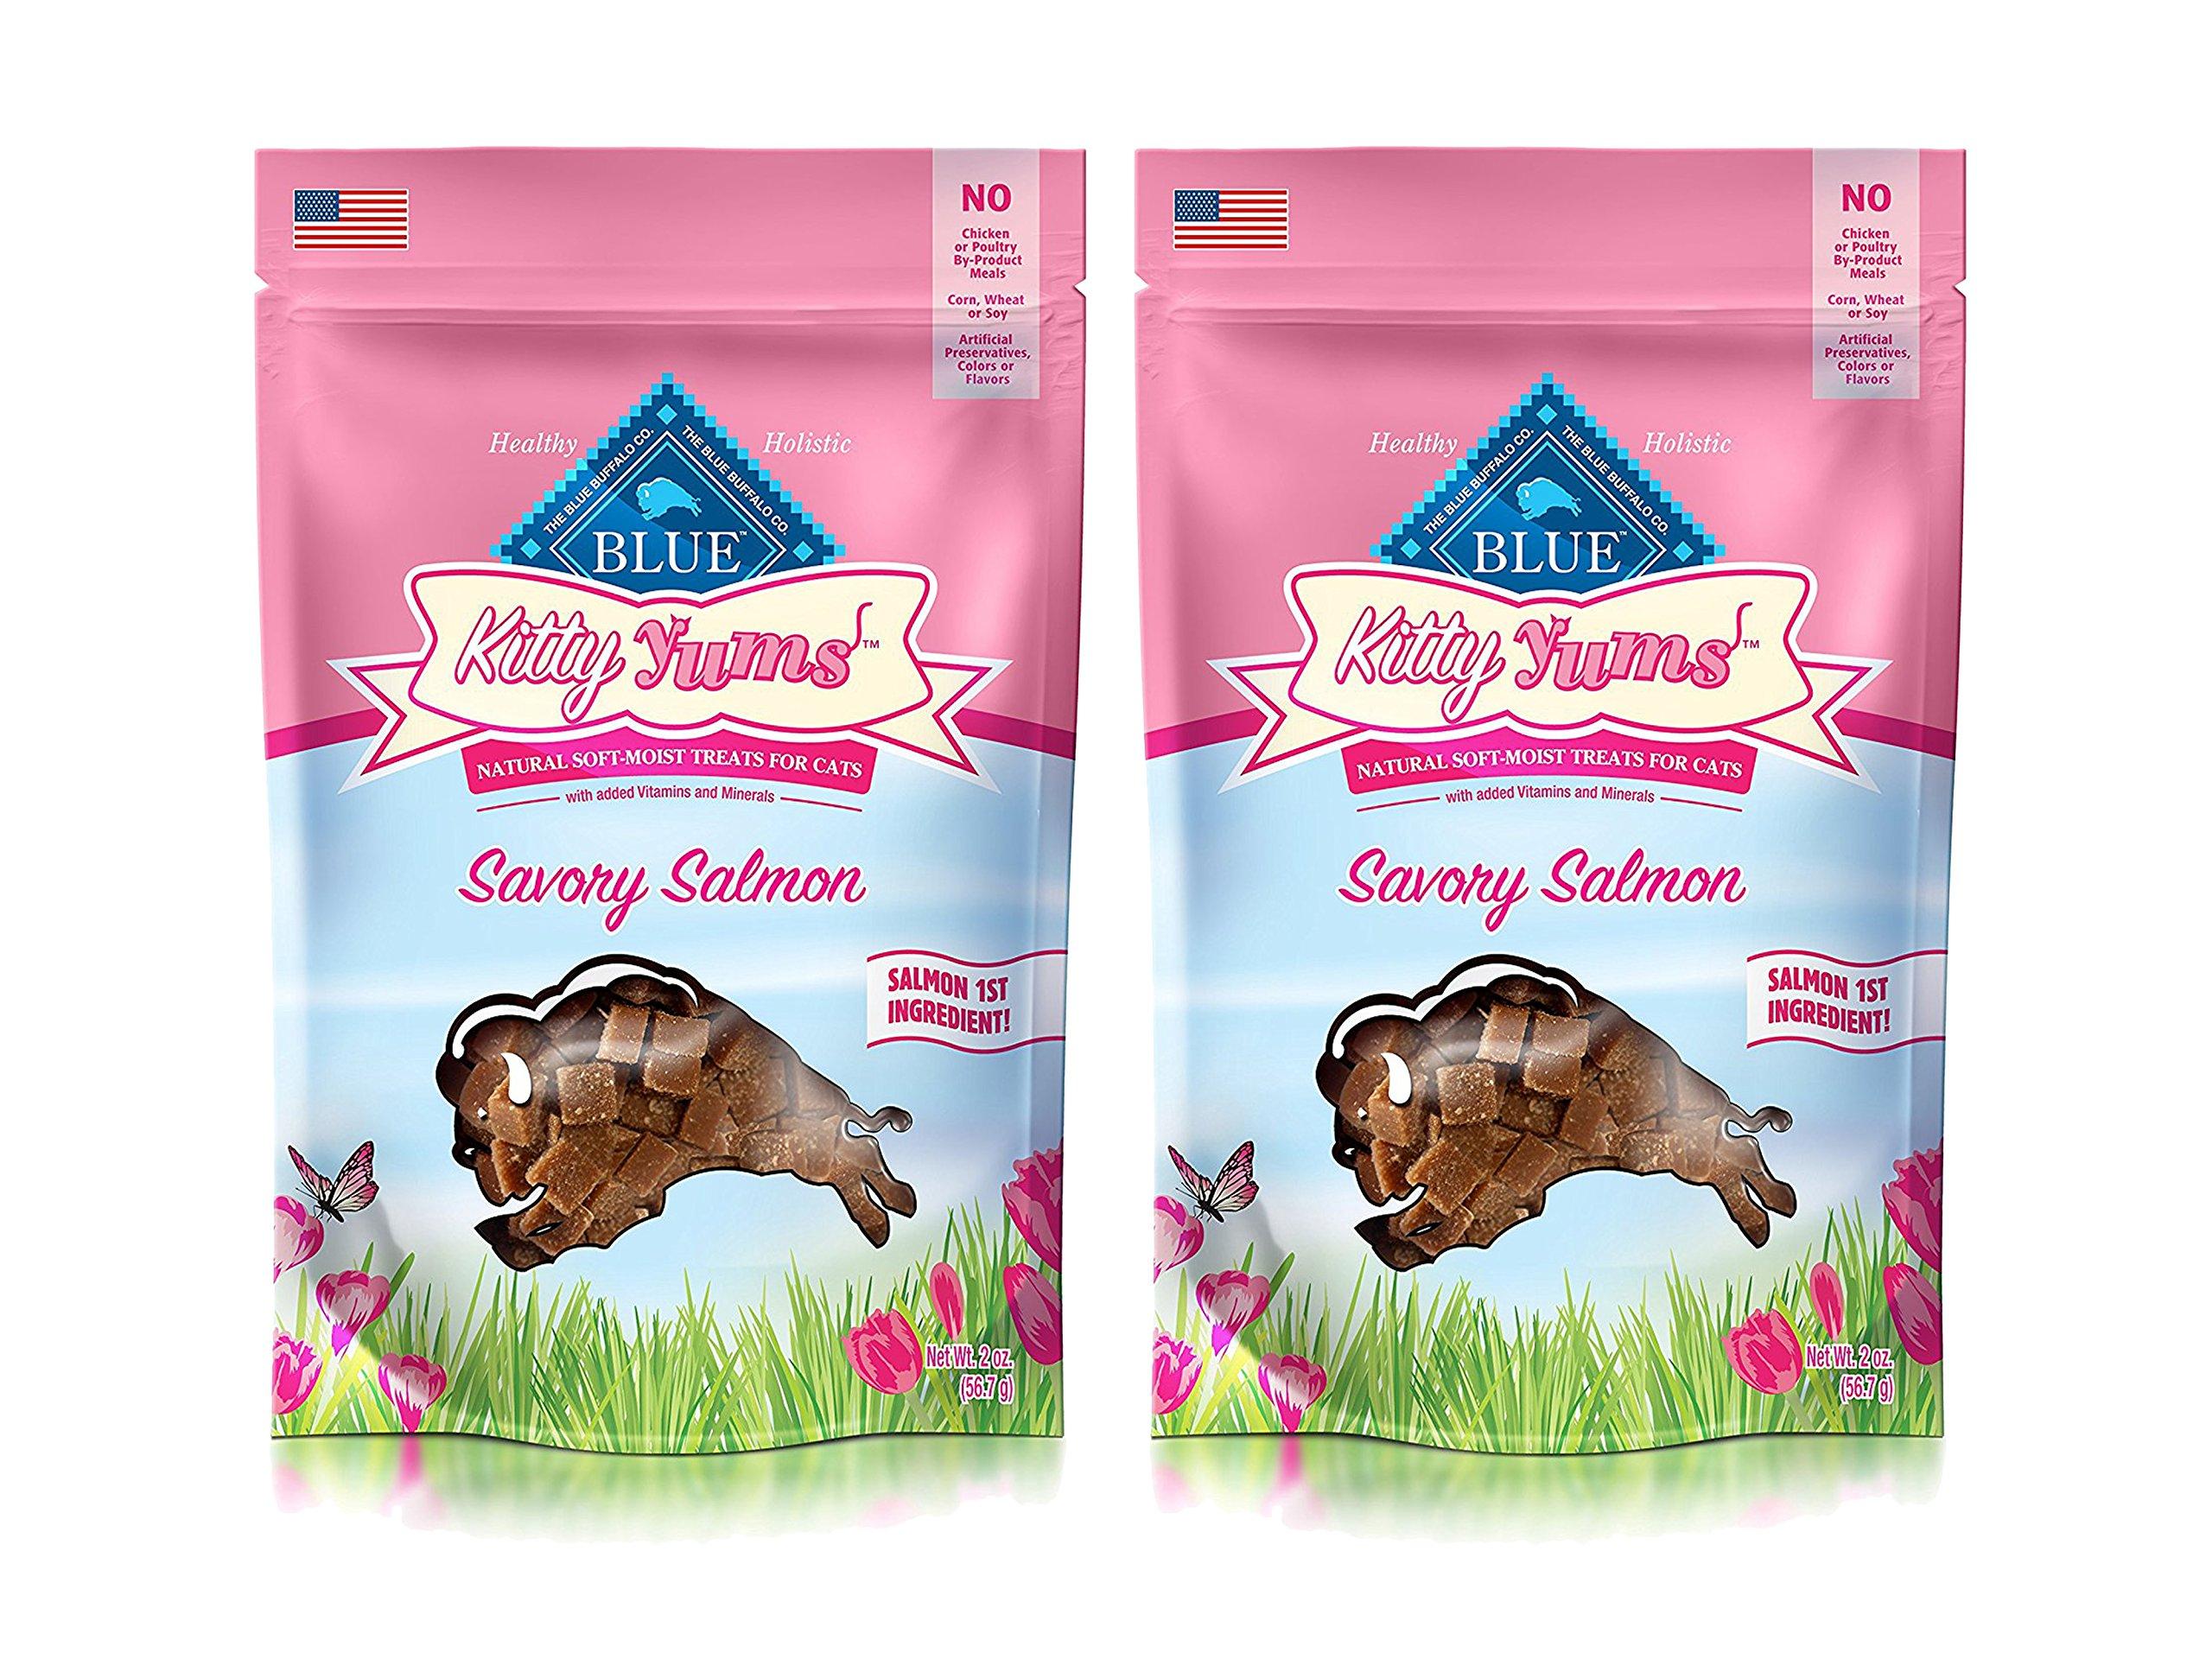 Animal Supply Co. Set of 2 Blue Kitty Yums Savory Salmon Recipe bundled by Maven Gifts